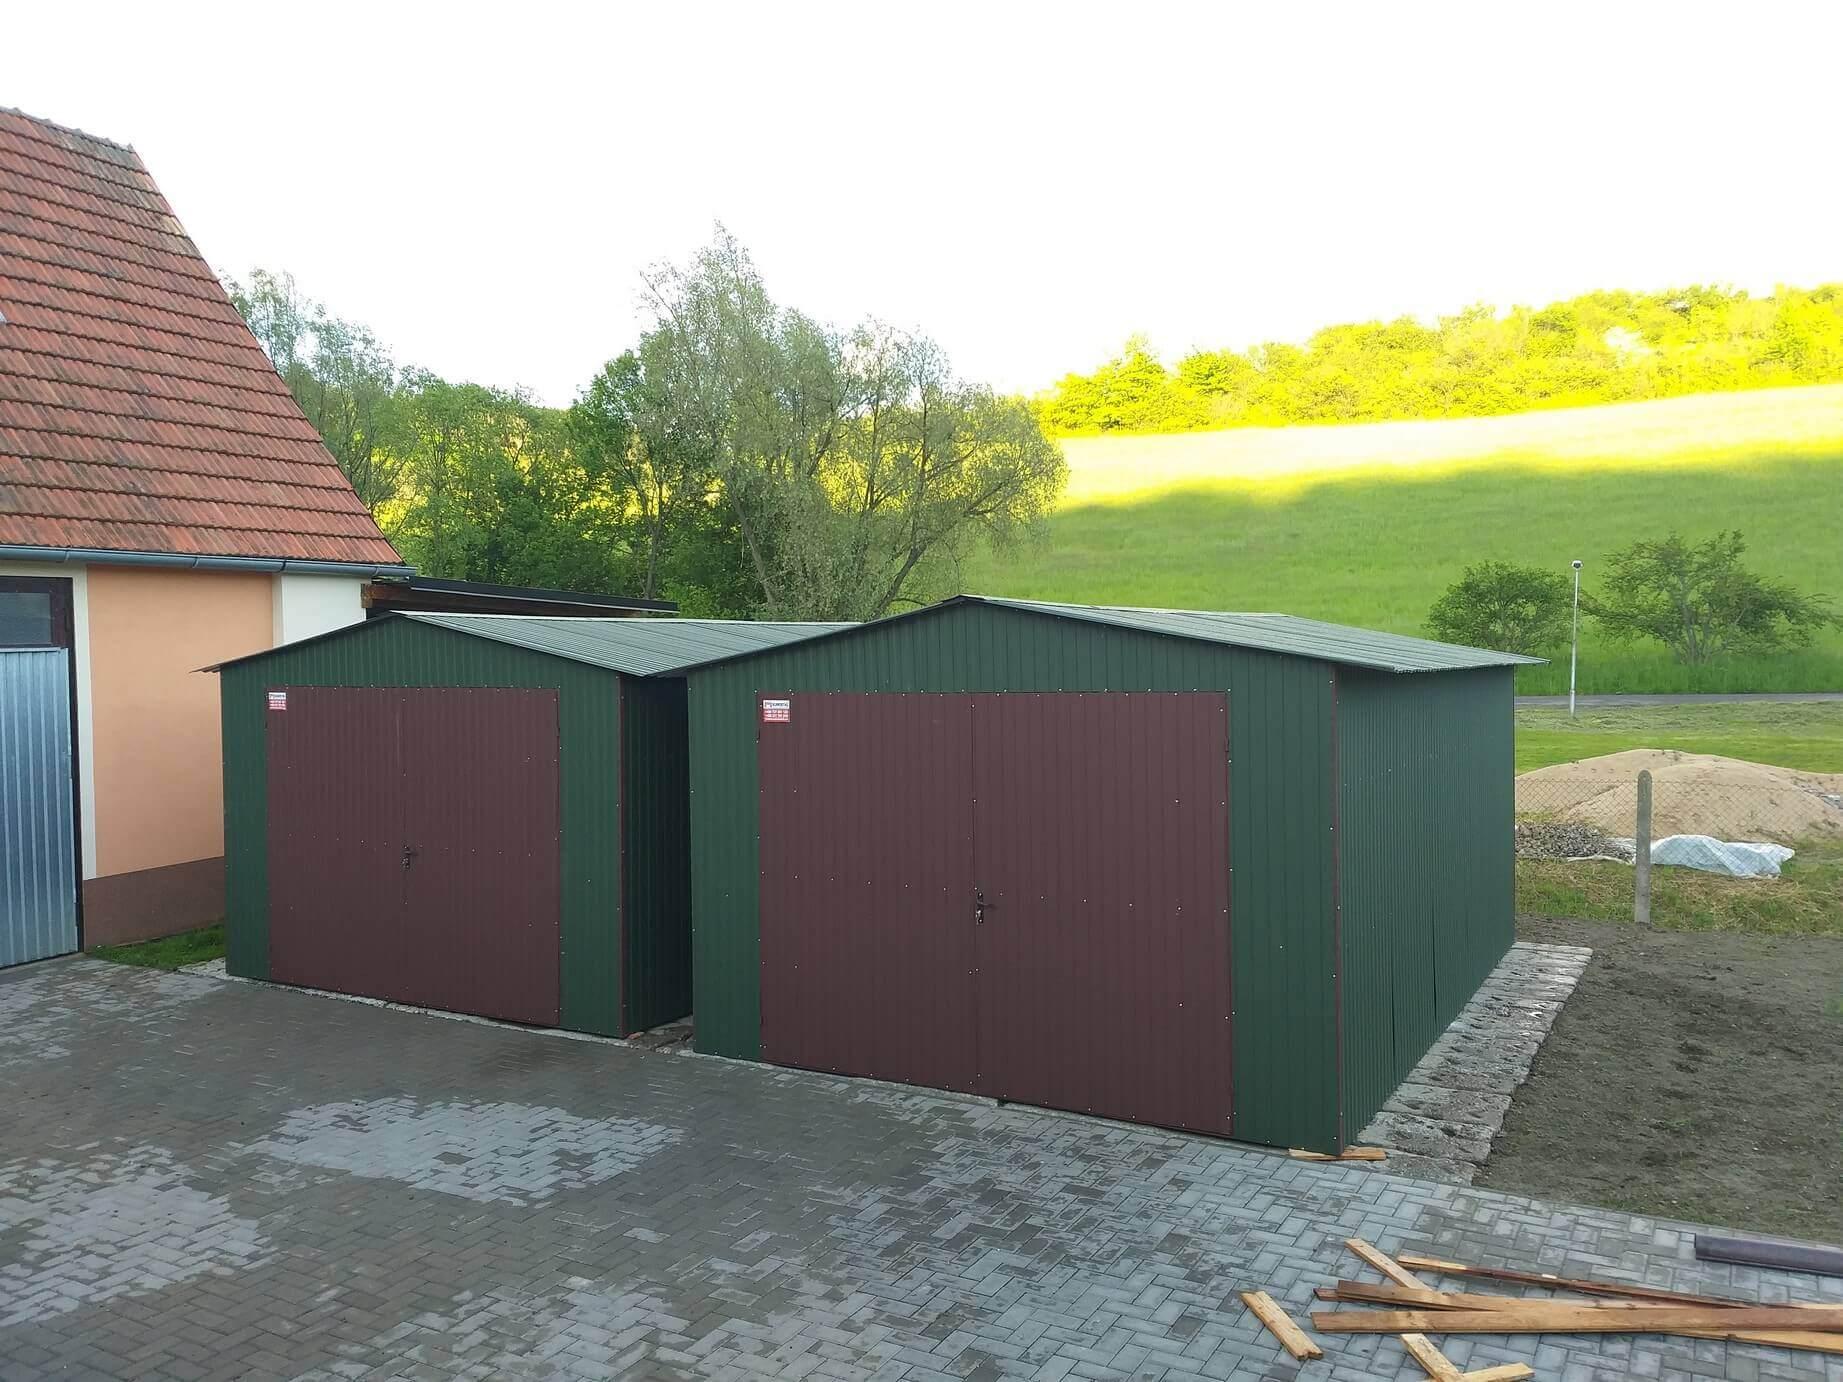 Plechová garáž 4×6 sedlová strecha BTX 6020